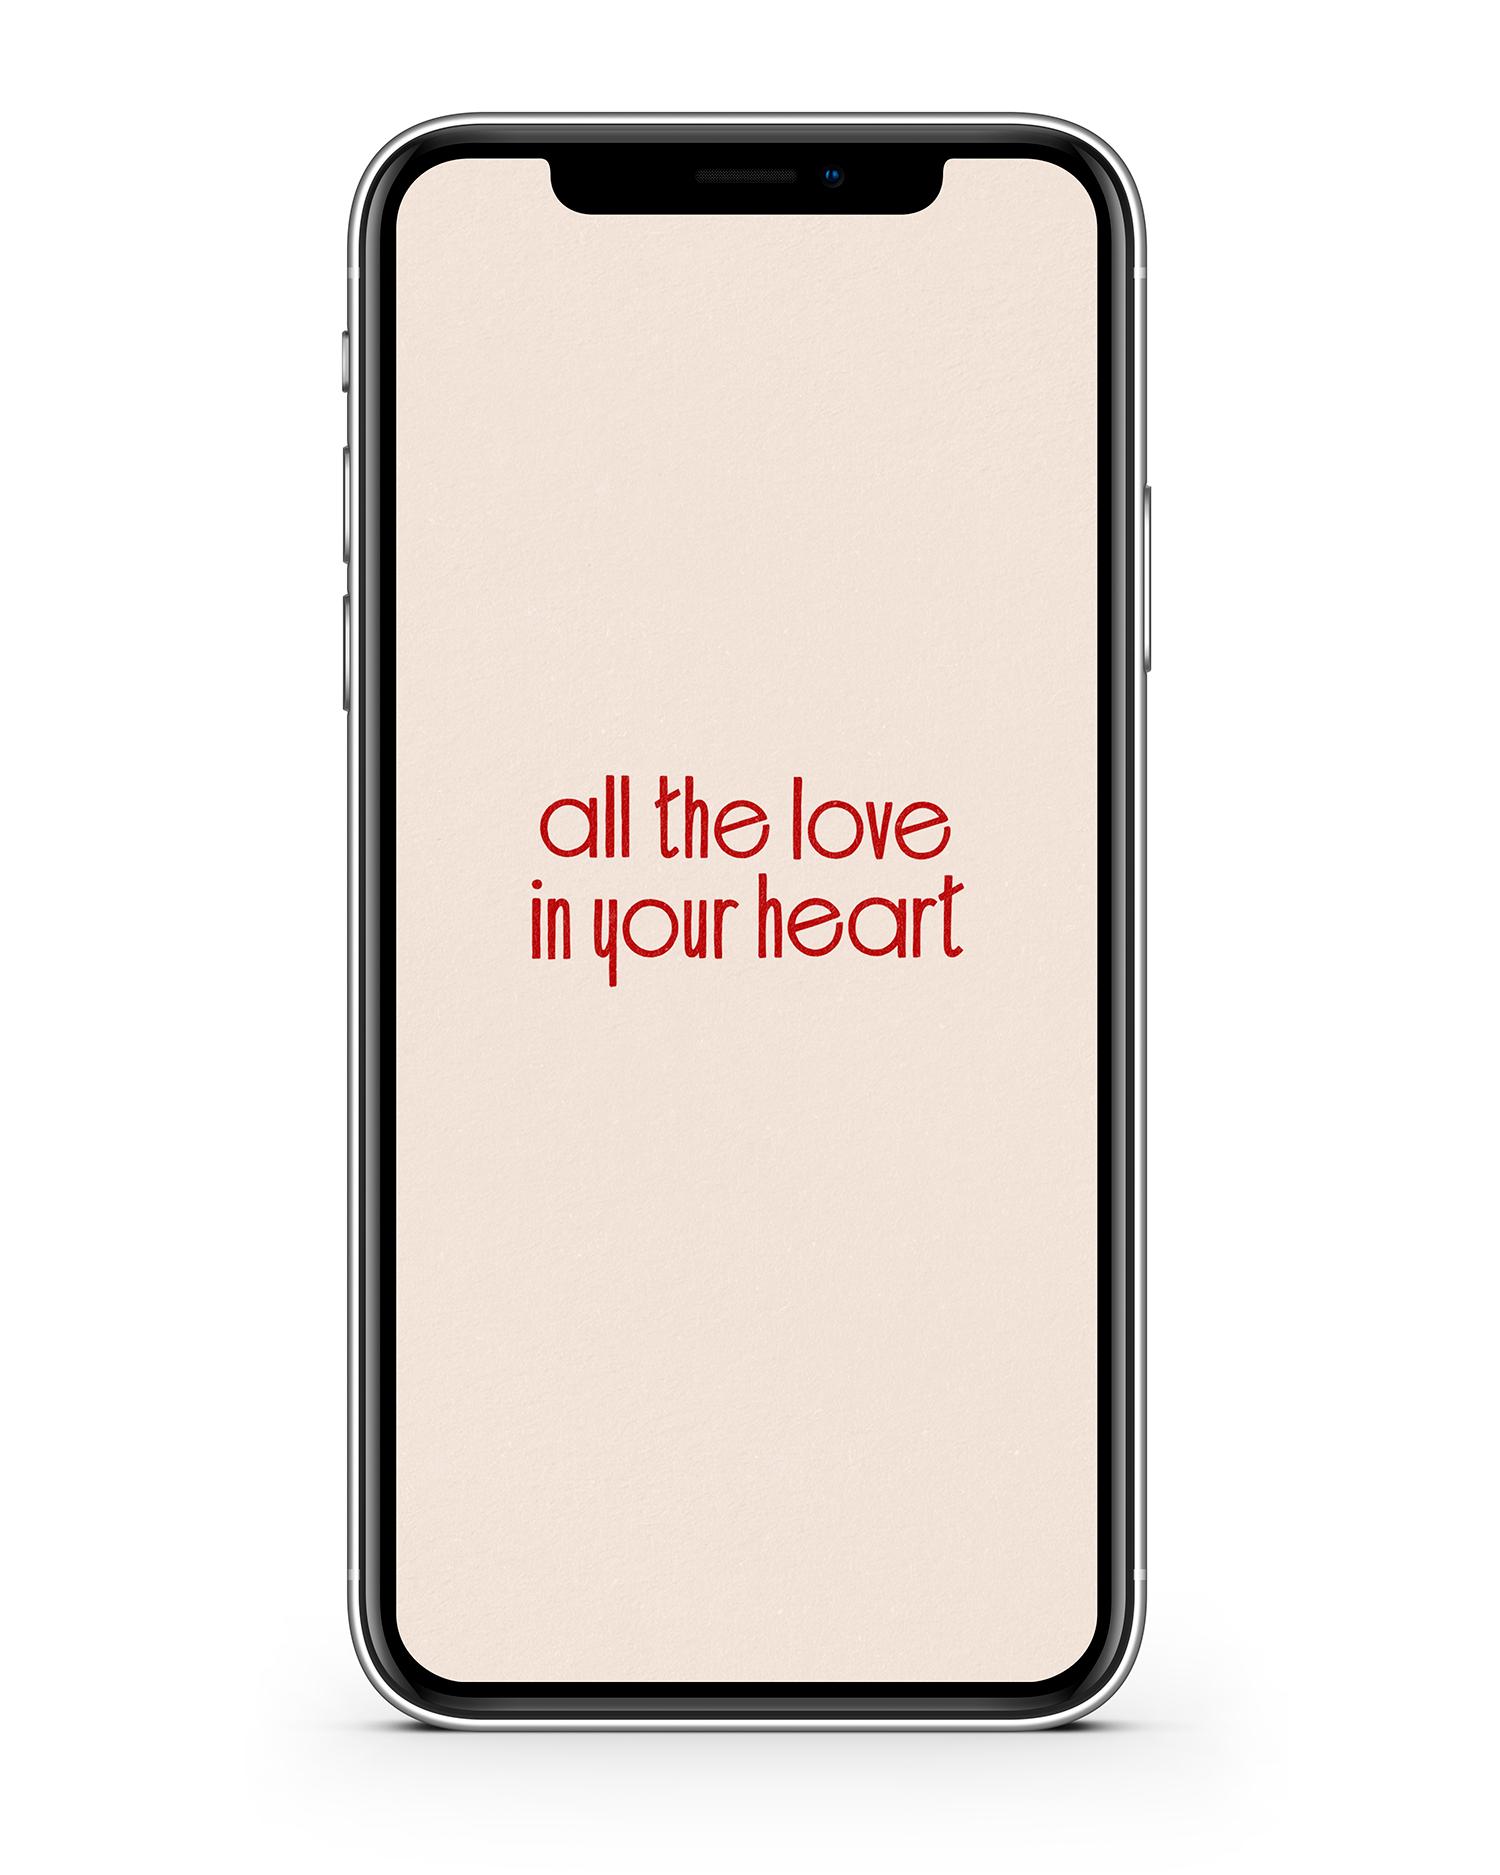 Beautiful Carole King Lyrics iPhone Wallpaper